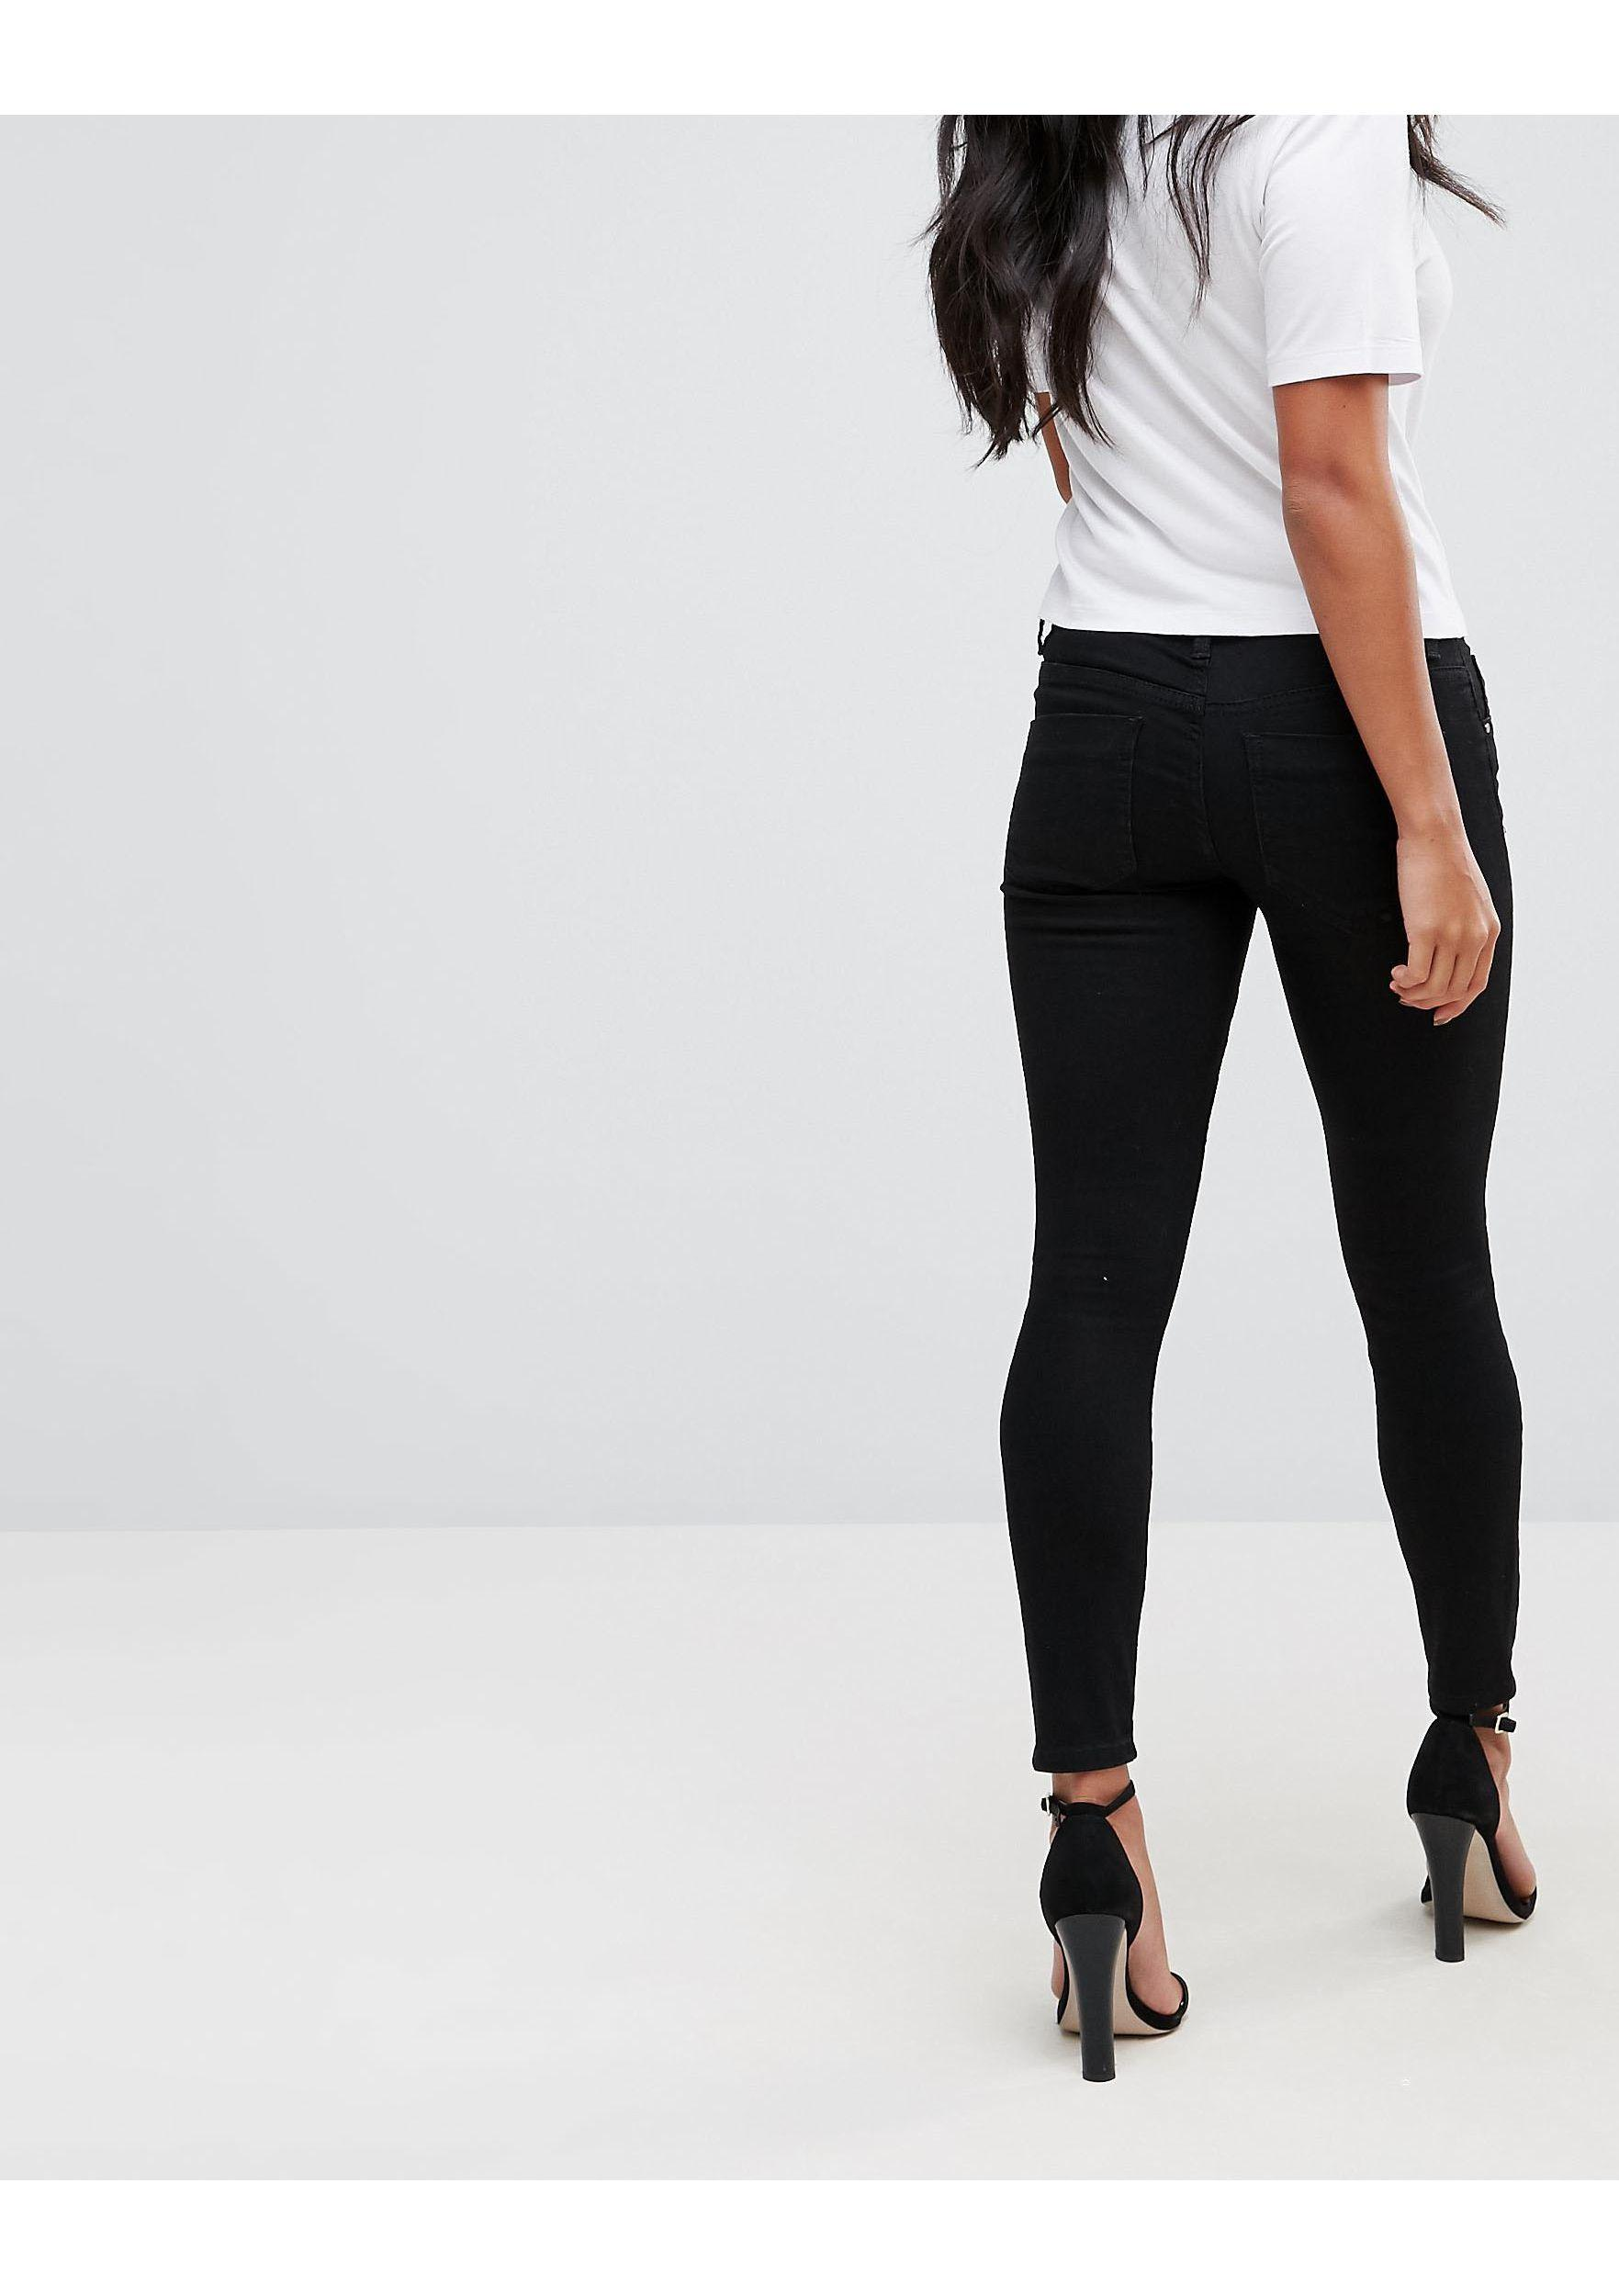 ASOS DESIGN PETITE - Whitby - Jean skinny taille basse - pur Jean ASOS en coloris Noir